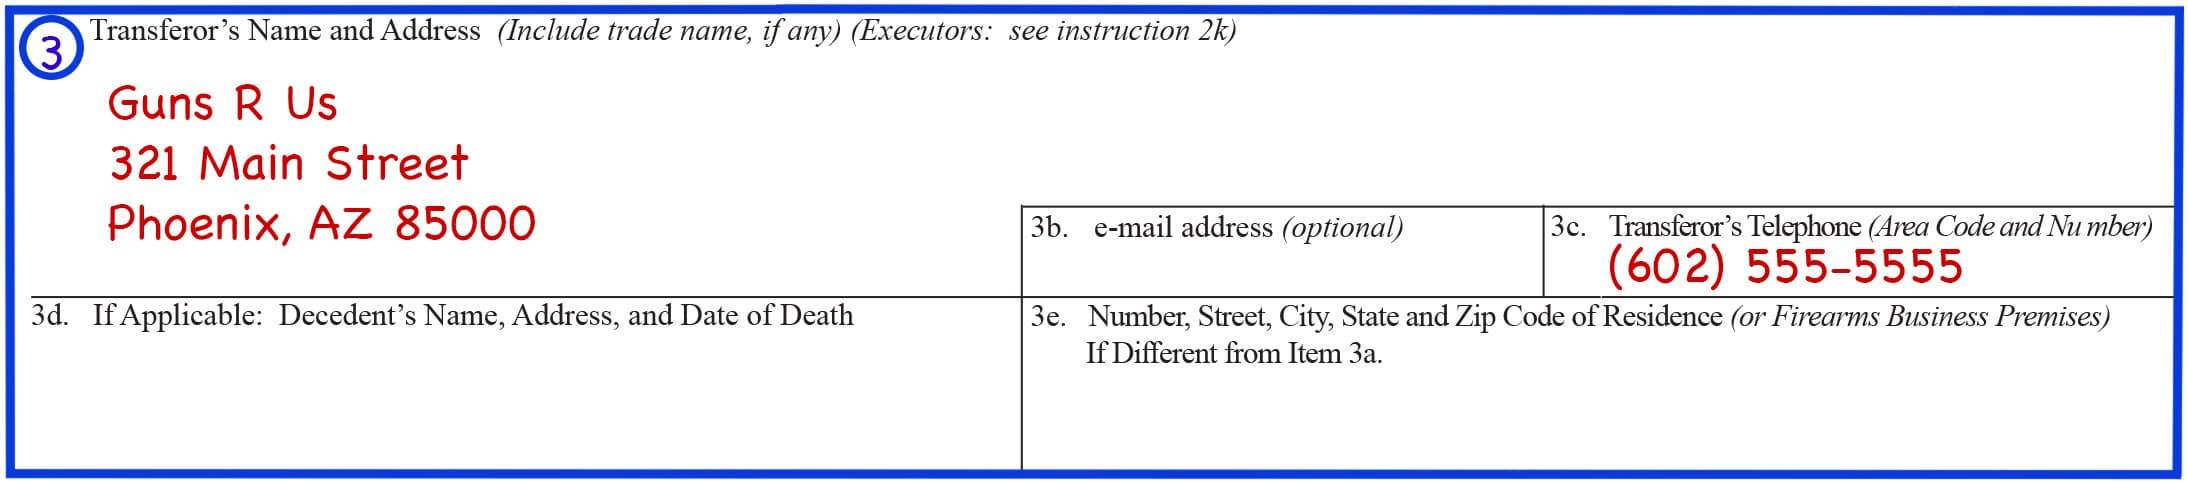 Form 4 Box 3